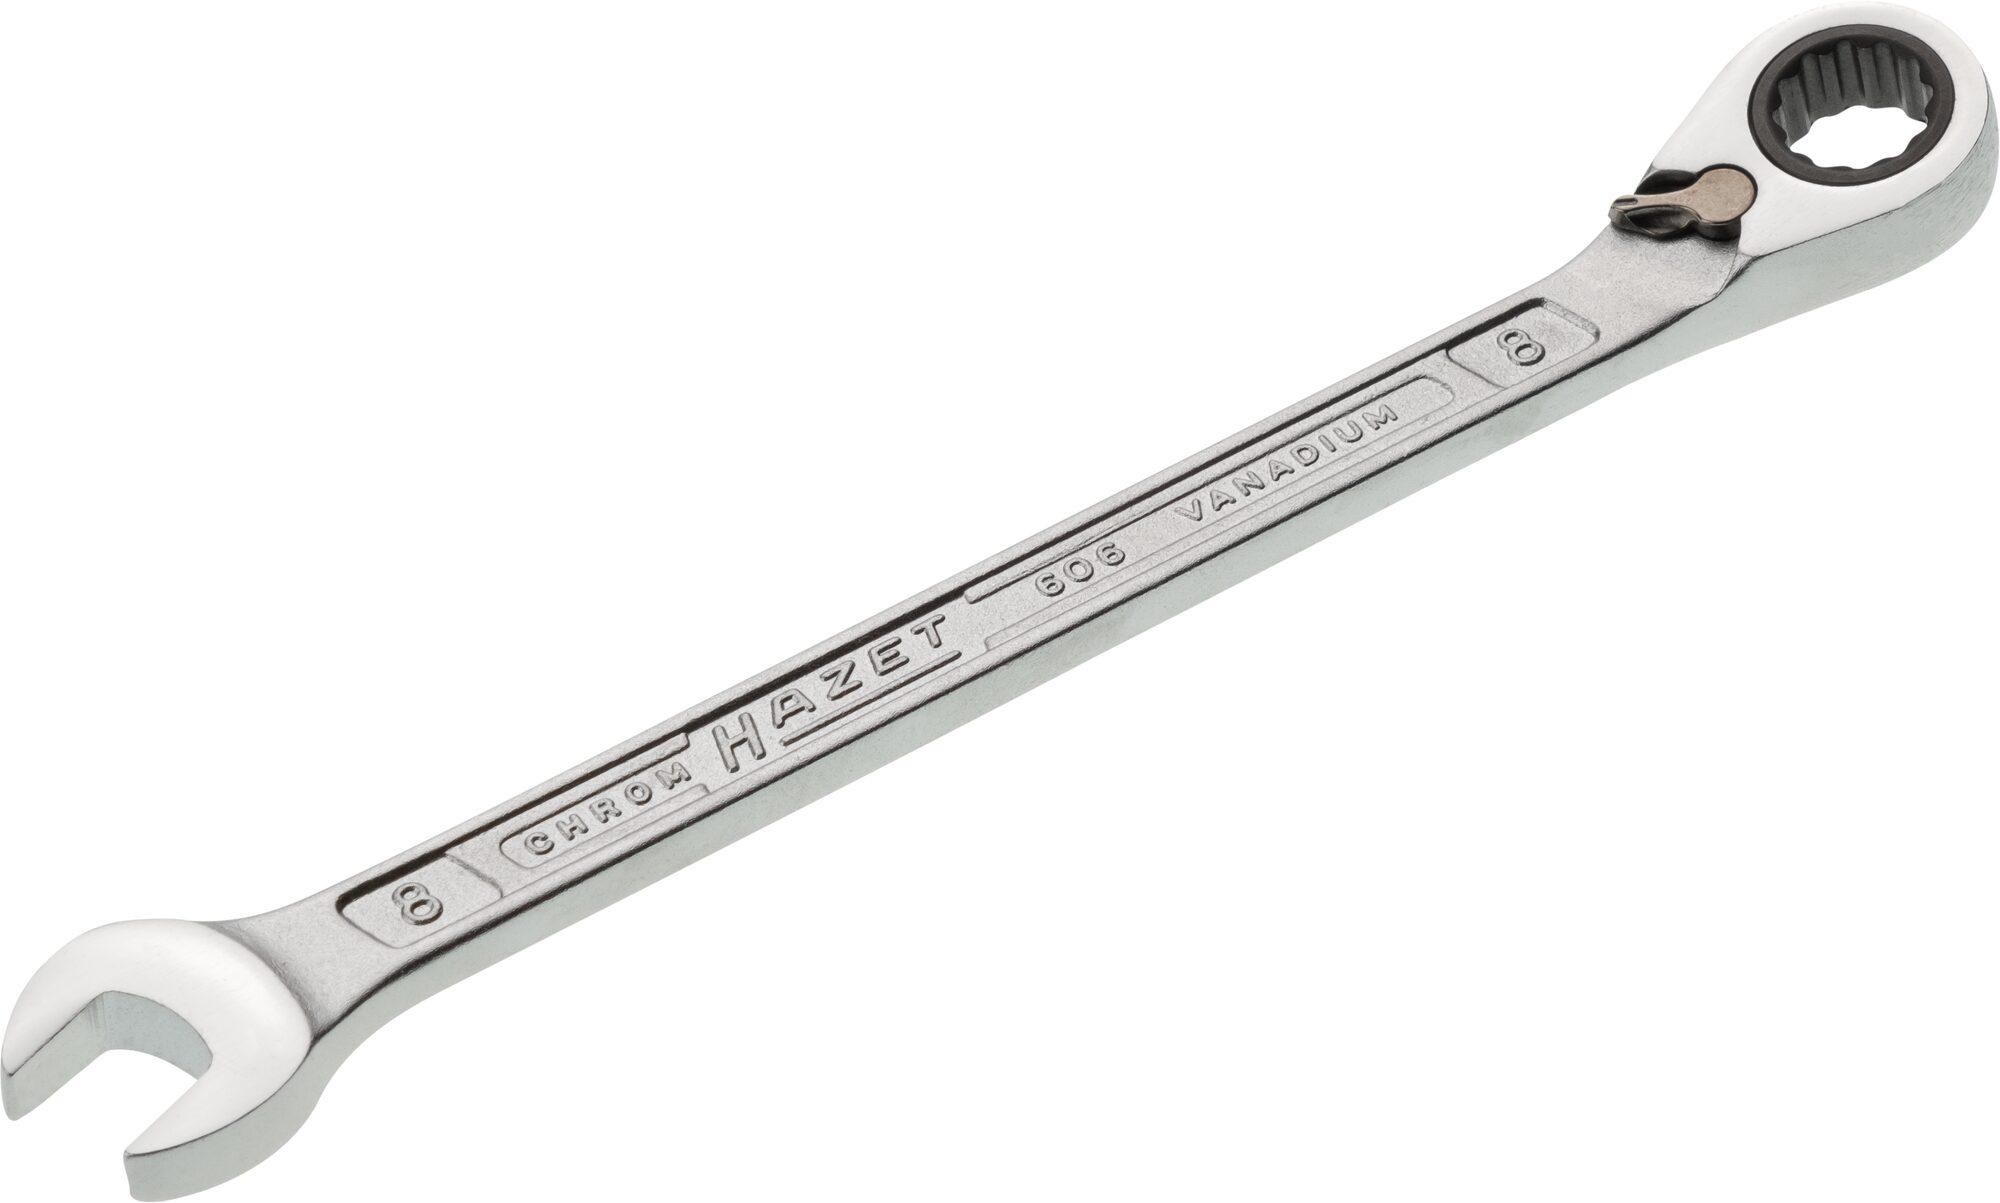 HAZET Knarren Ring-Maulschlüssel 606-8 ∙ Außen-Doppel-Sechskant-Tractionsprofil ∙ 8 mm